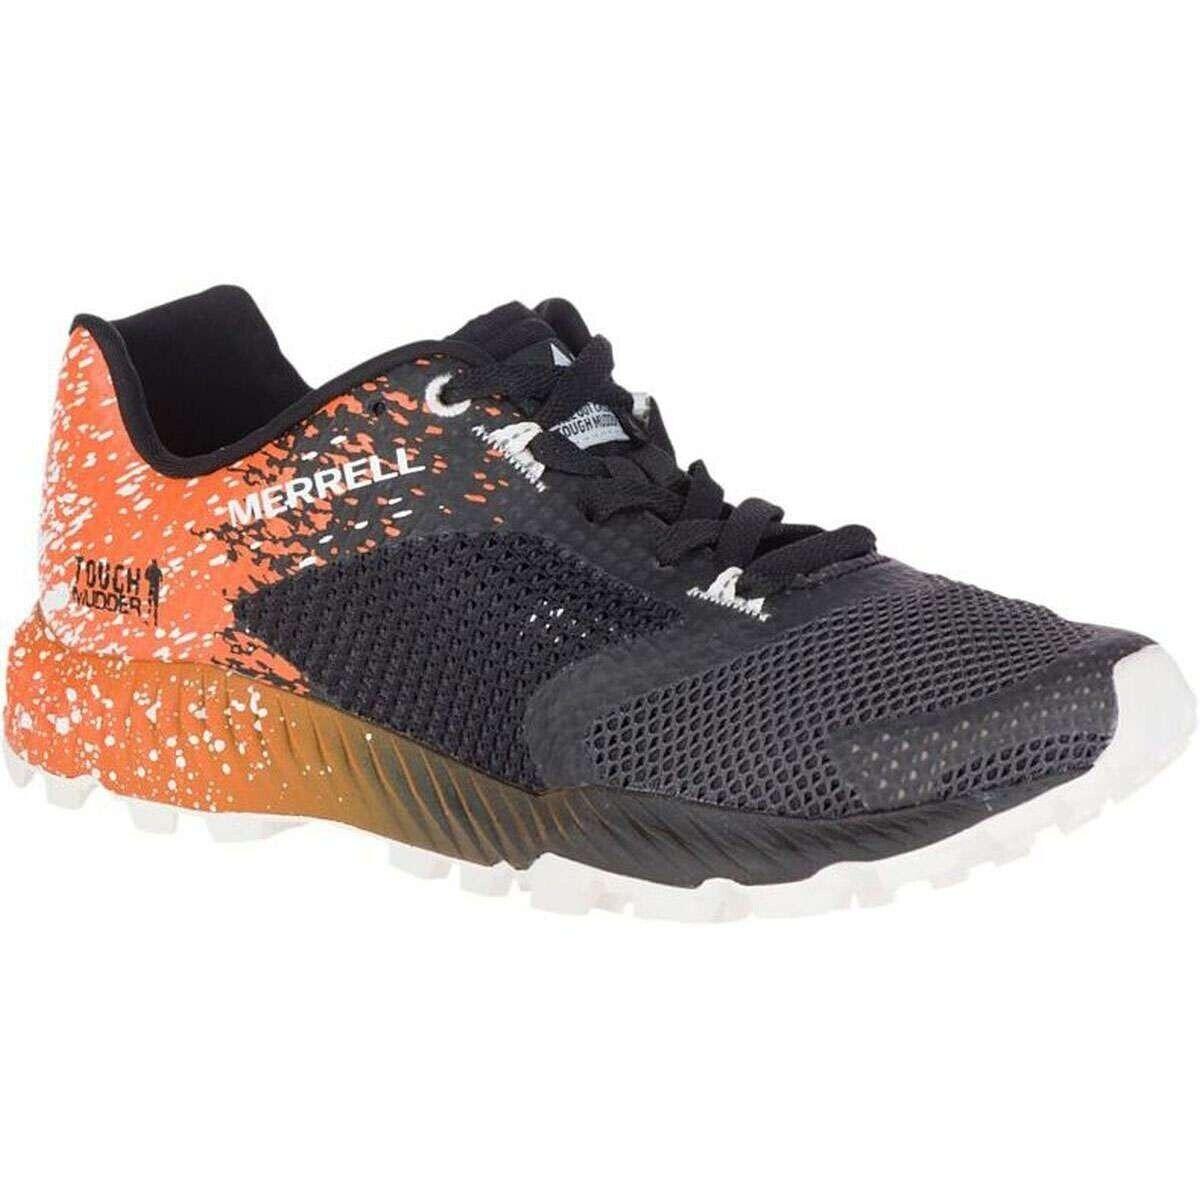 Merrell out Crush Tough Mudder 2 femmes Trail FonctionneHommest FonctionneHommest chaussures Orange